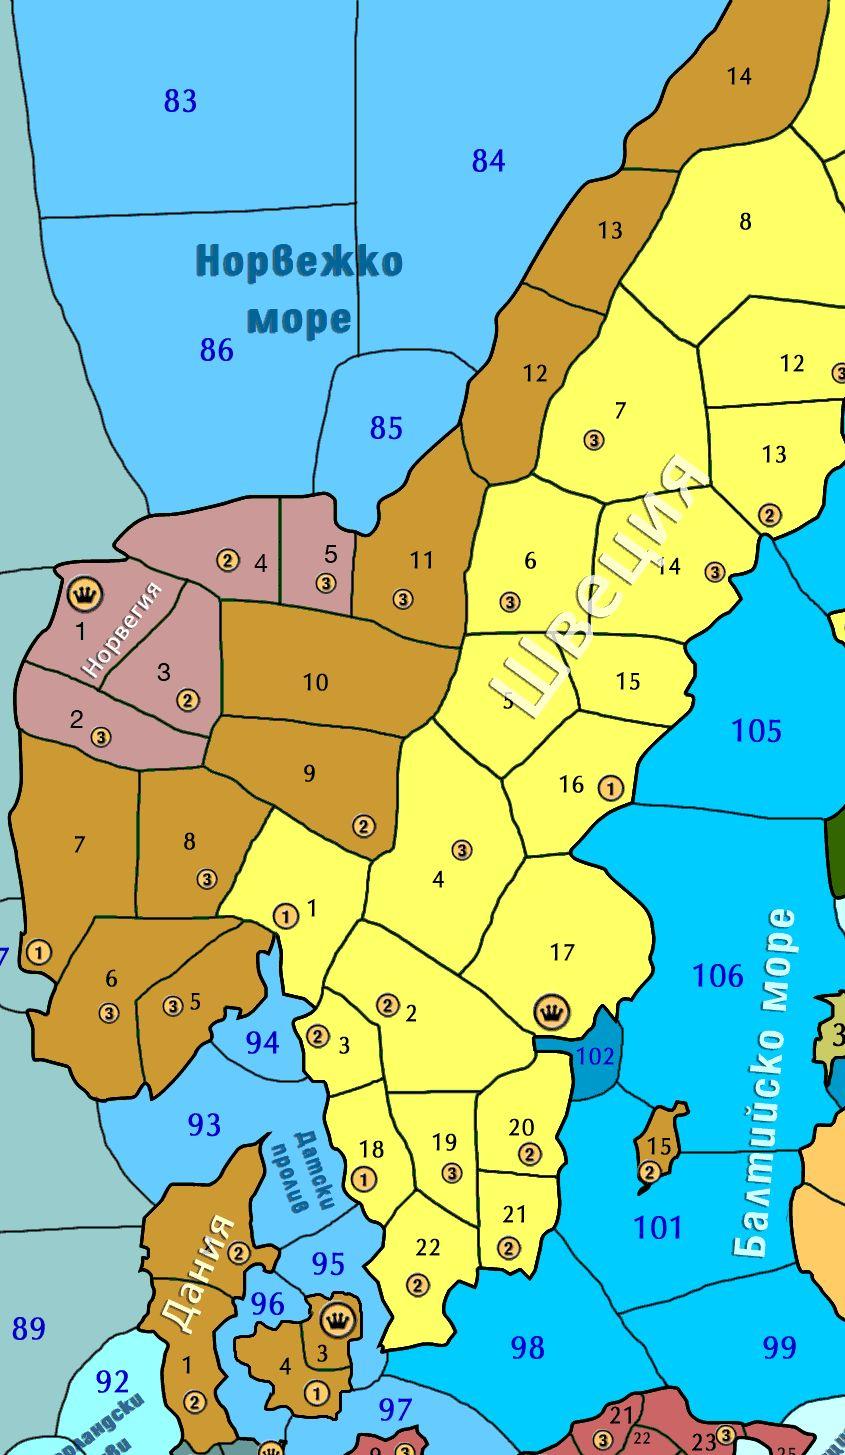 Дания - метрополия